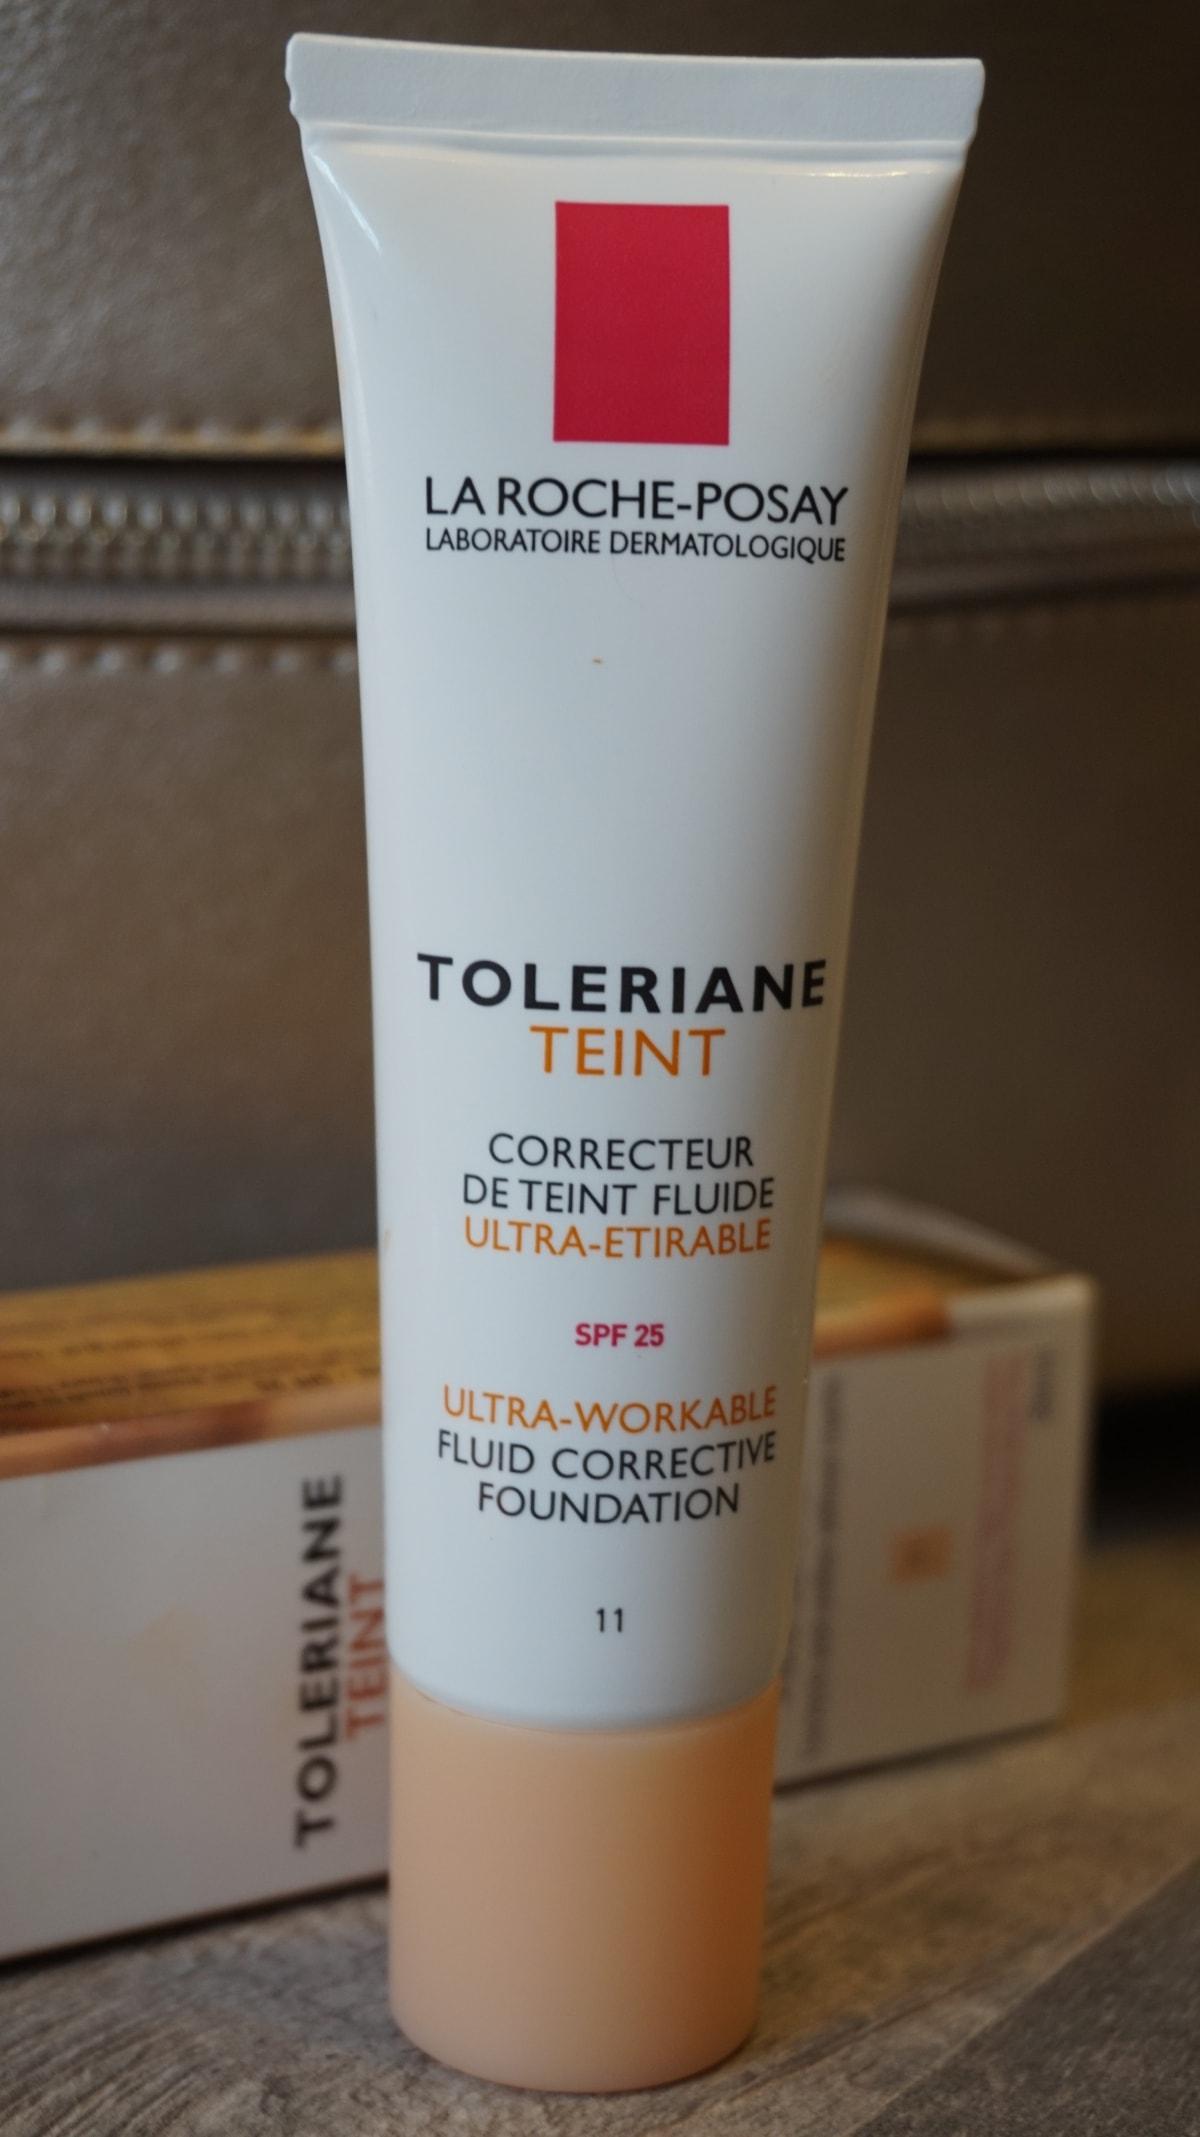 La Roche Posay Fond De Ten Toleriane Teint Fluid Review